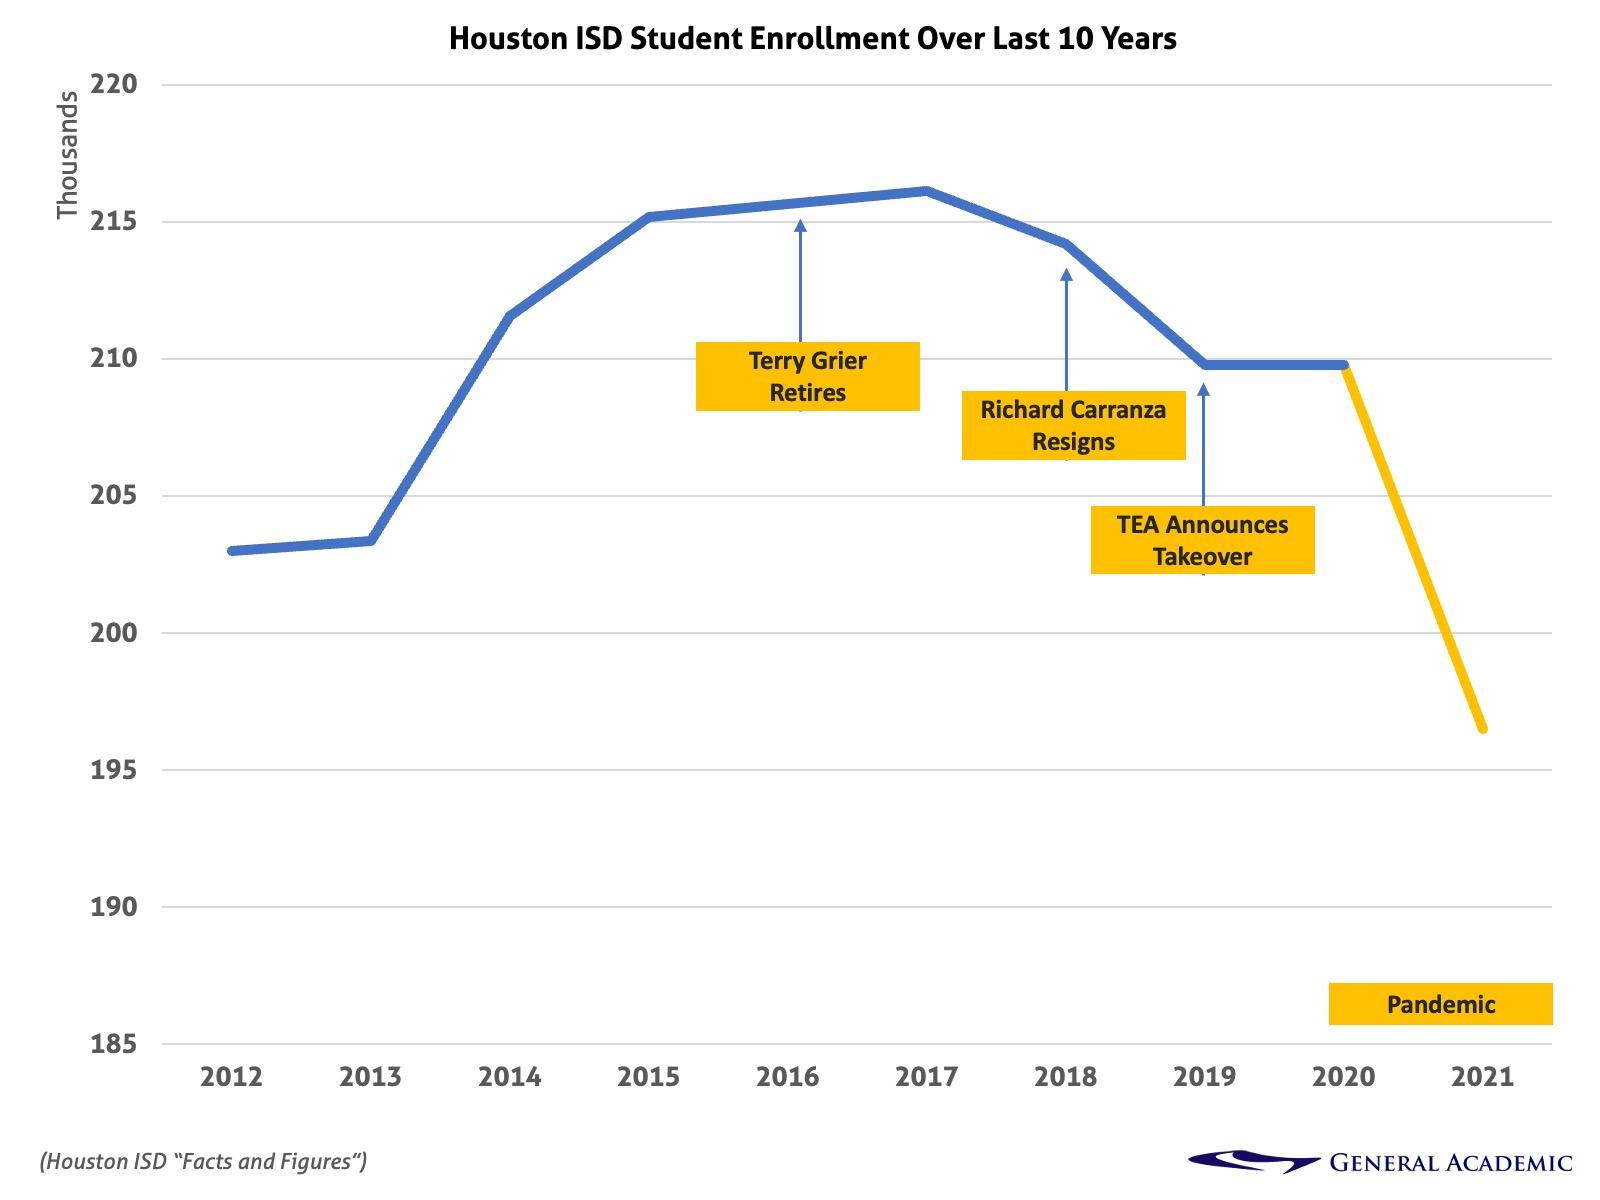 Houston public school enrollment over last 10 years.